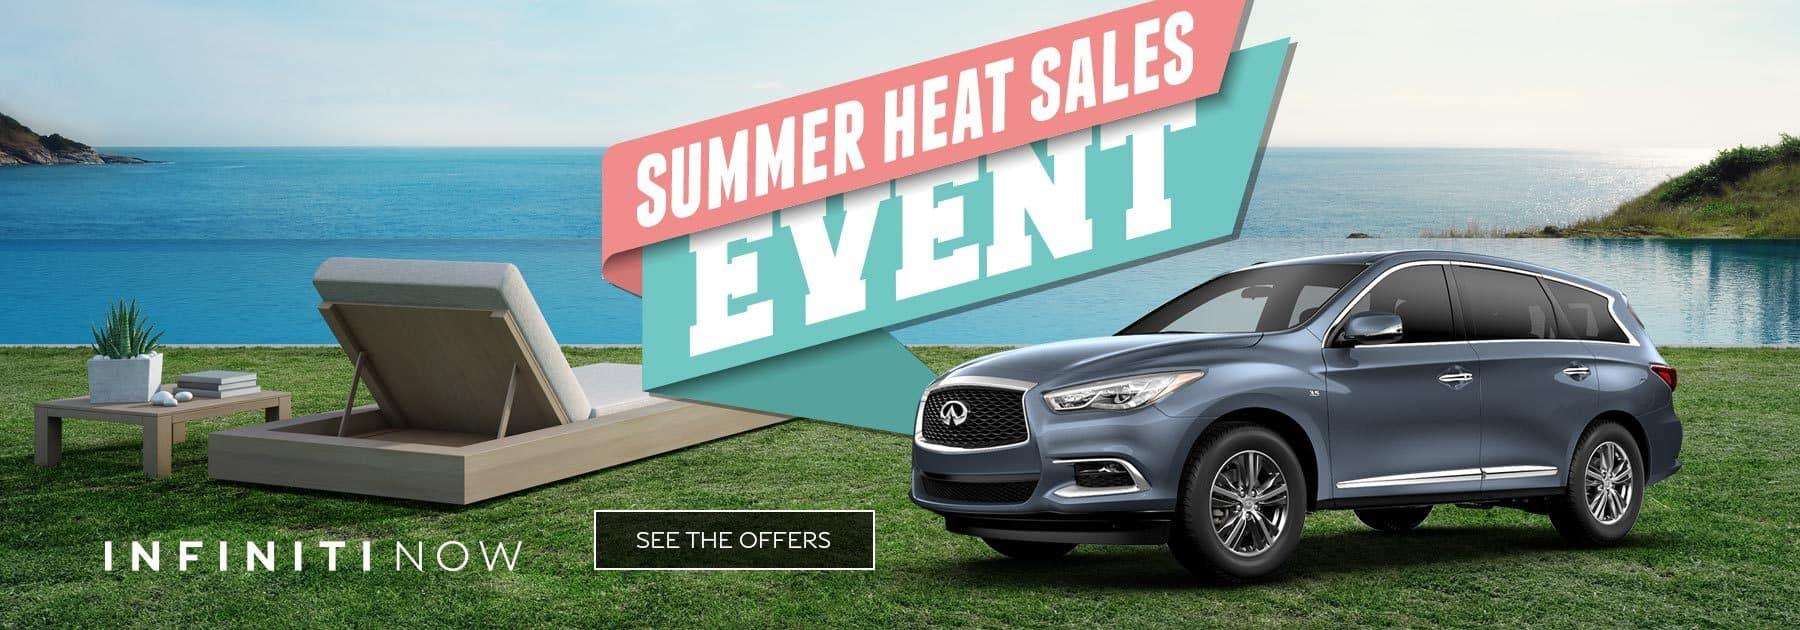 Summer Heat INFINITI Sales Event